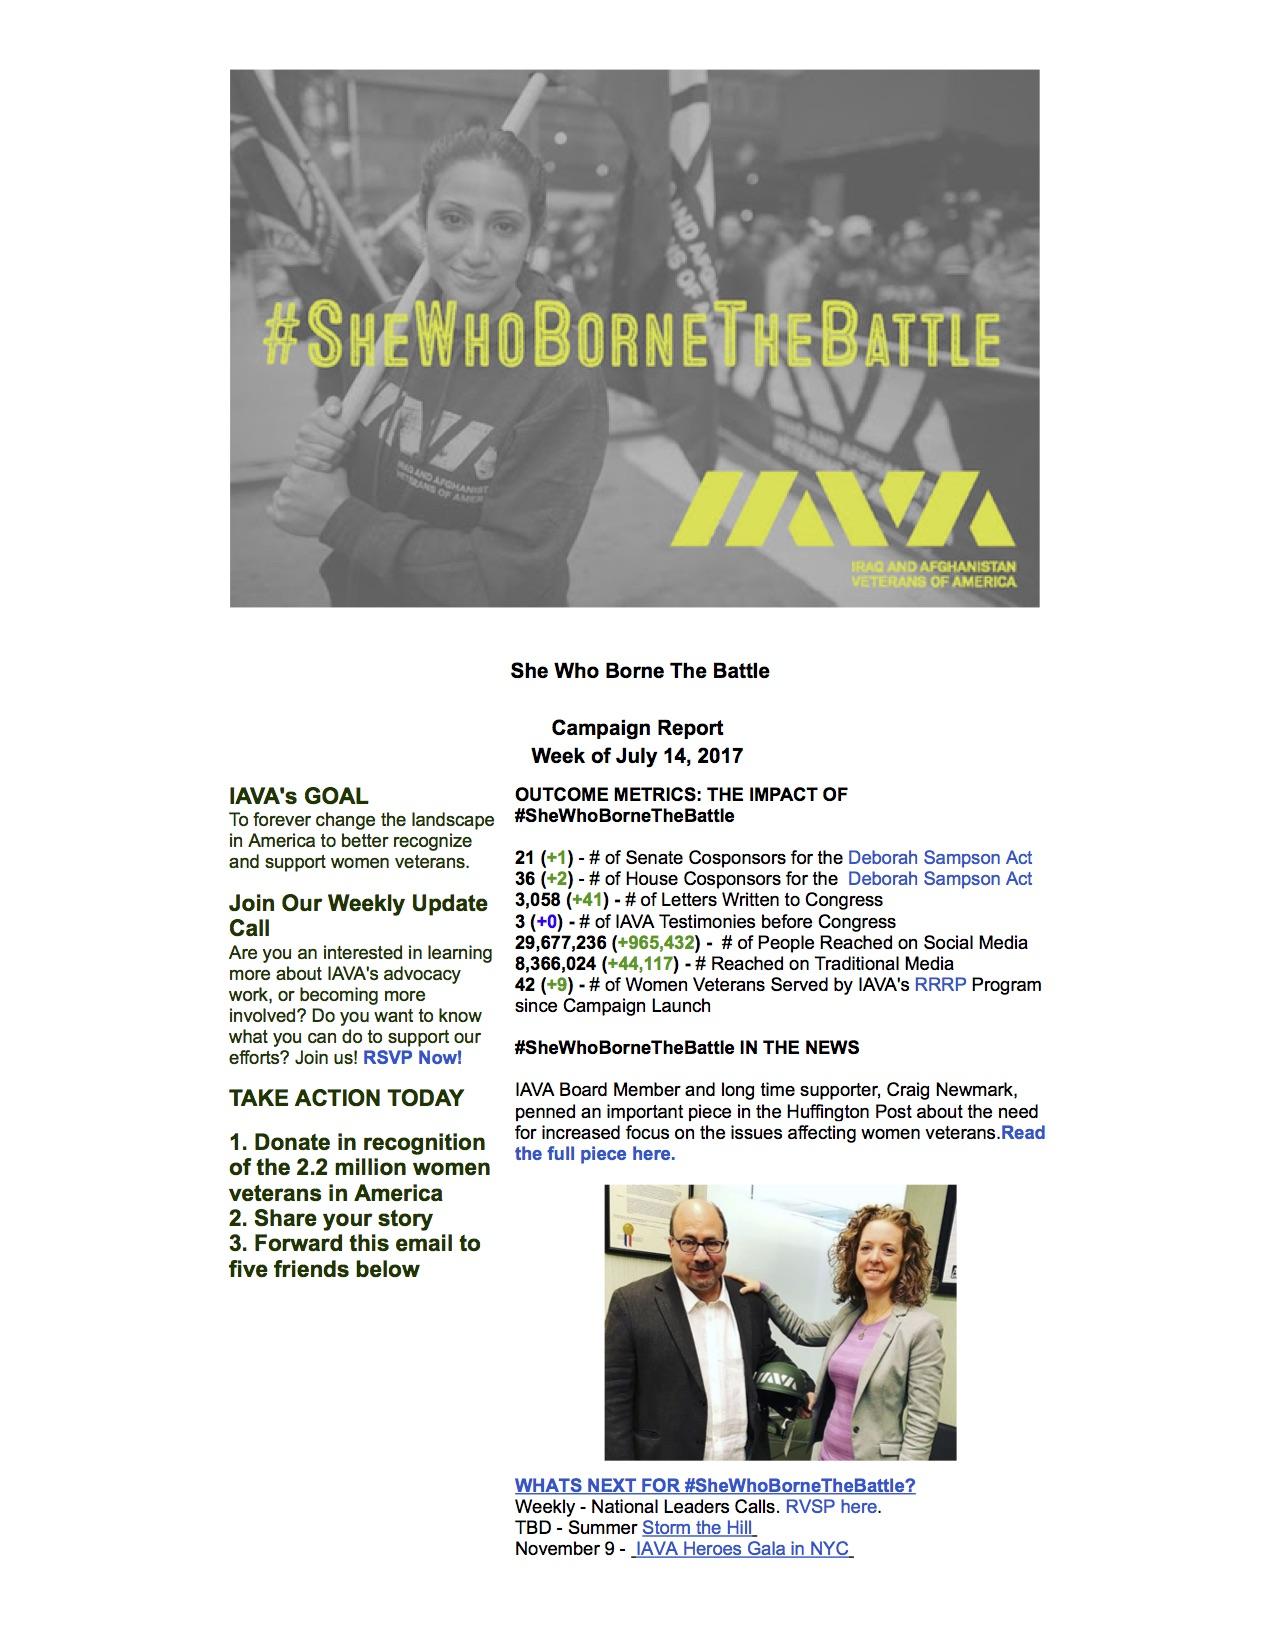 SWBTB Report 7.14.17